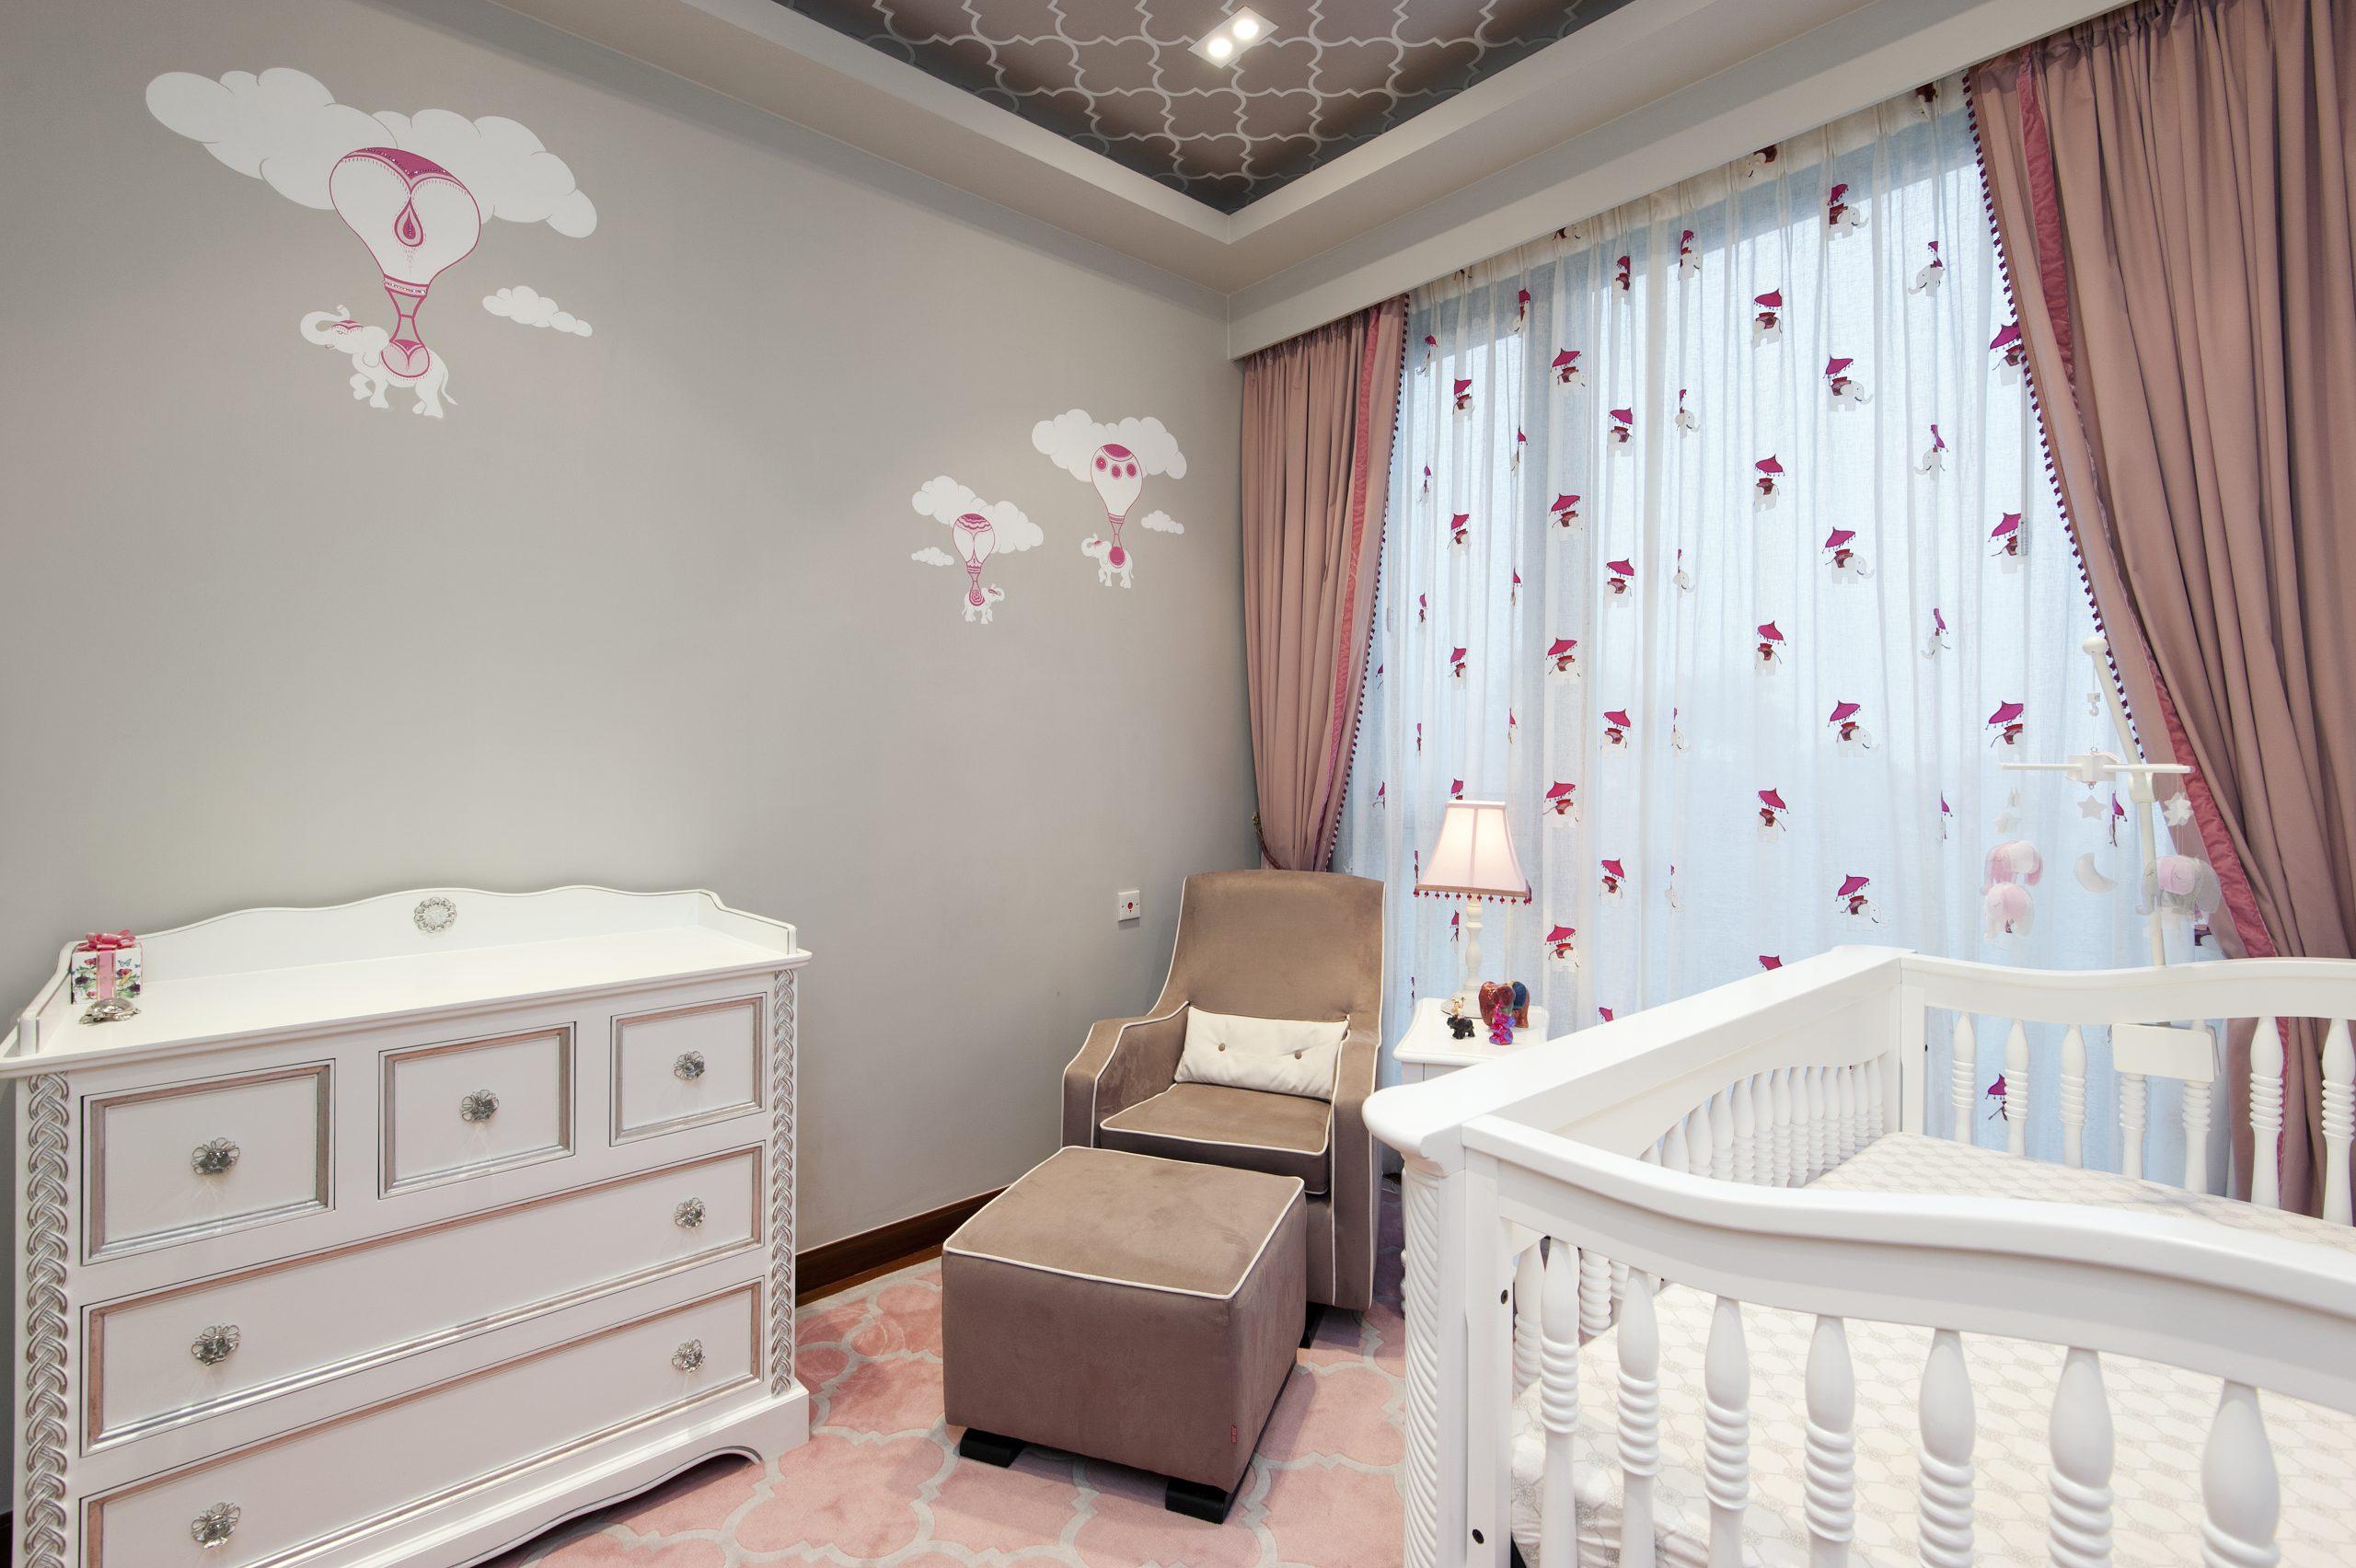 Barker Road Nursery (1)